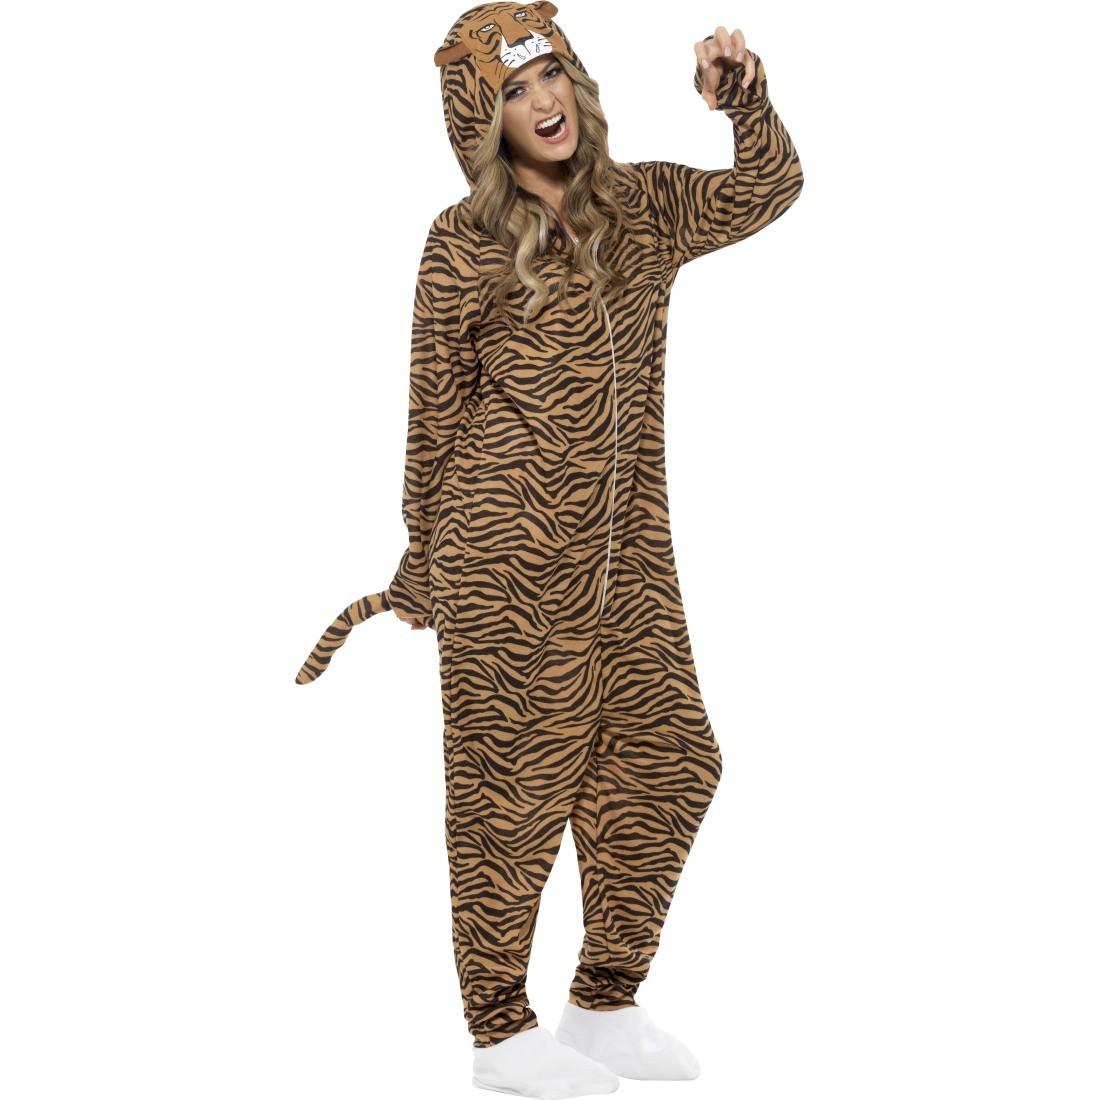 Tigerkostüm Jumpsuit Tiger Kostüm Ganzkörper Katzenkostüm Tierkostüm